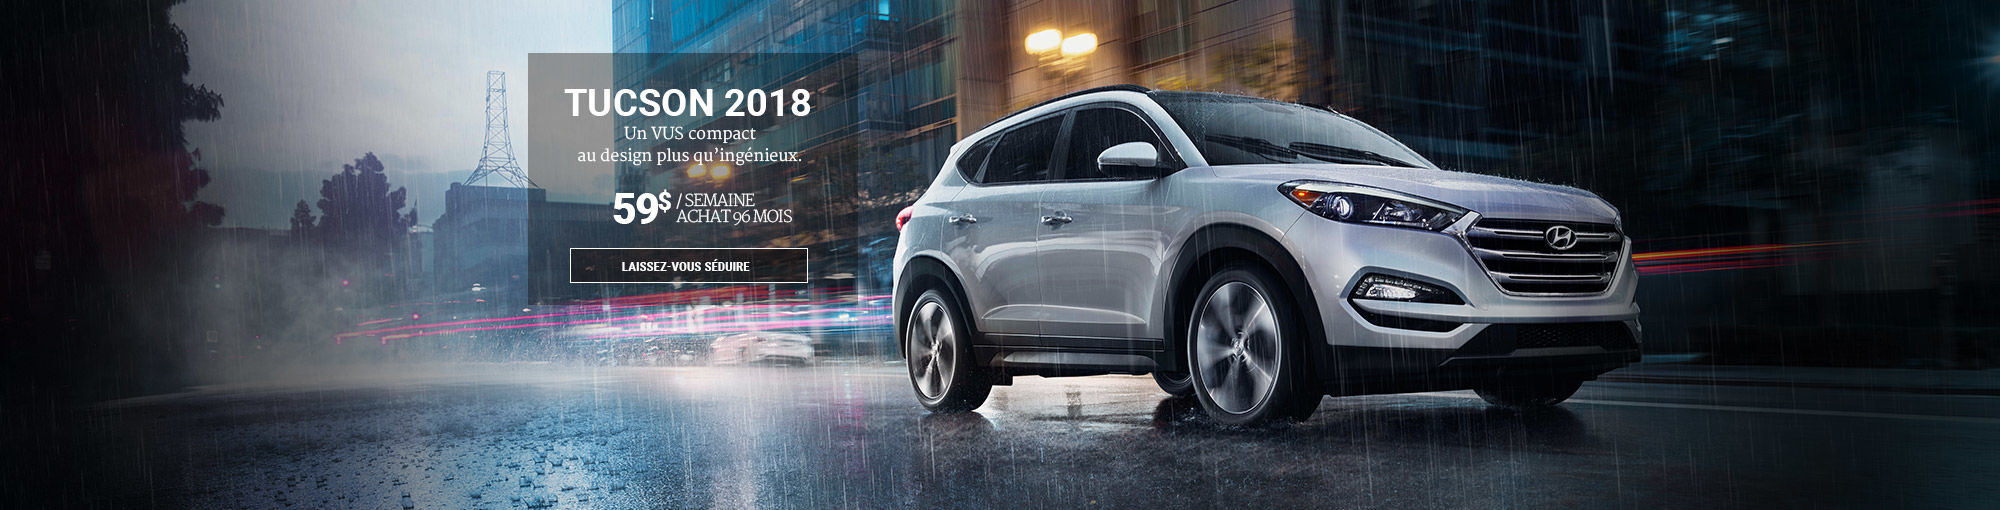 Hyundai Tucson 2018 header septembre